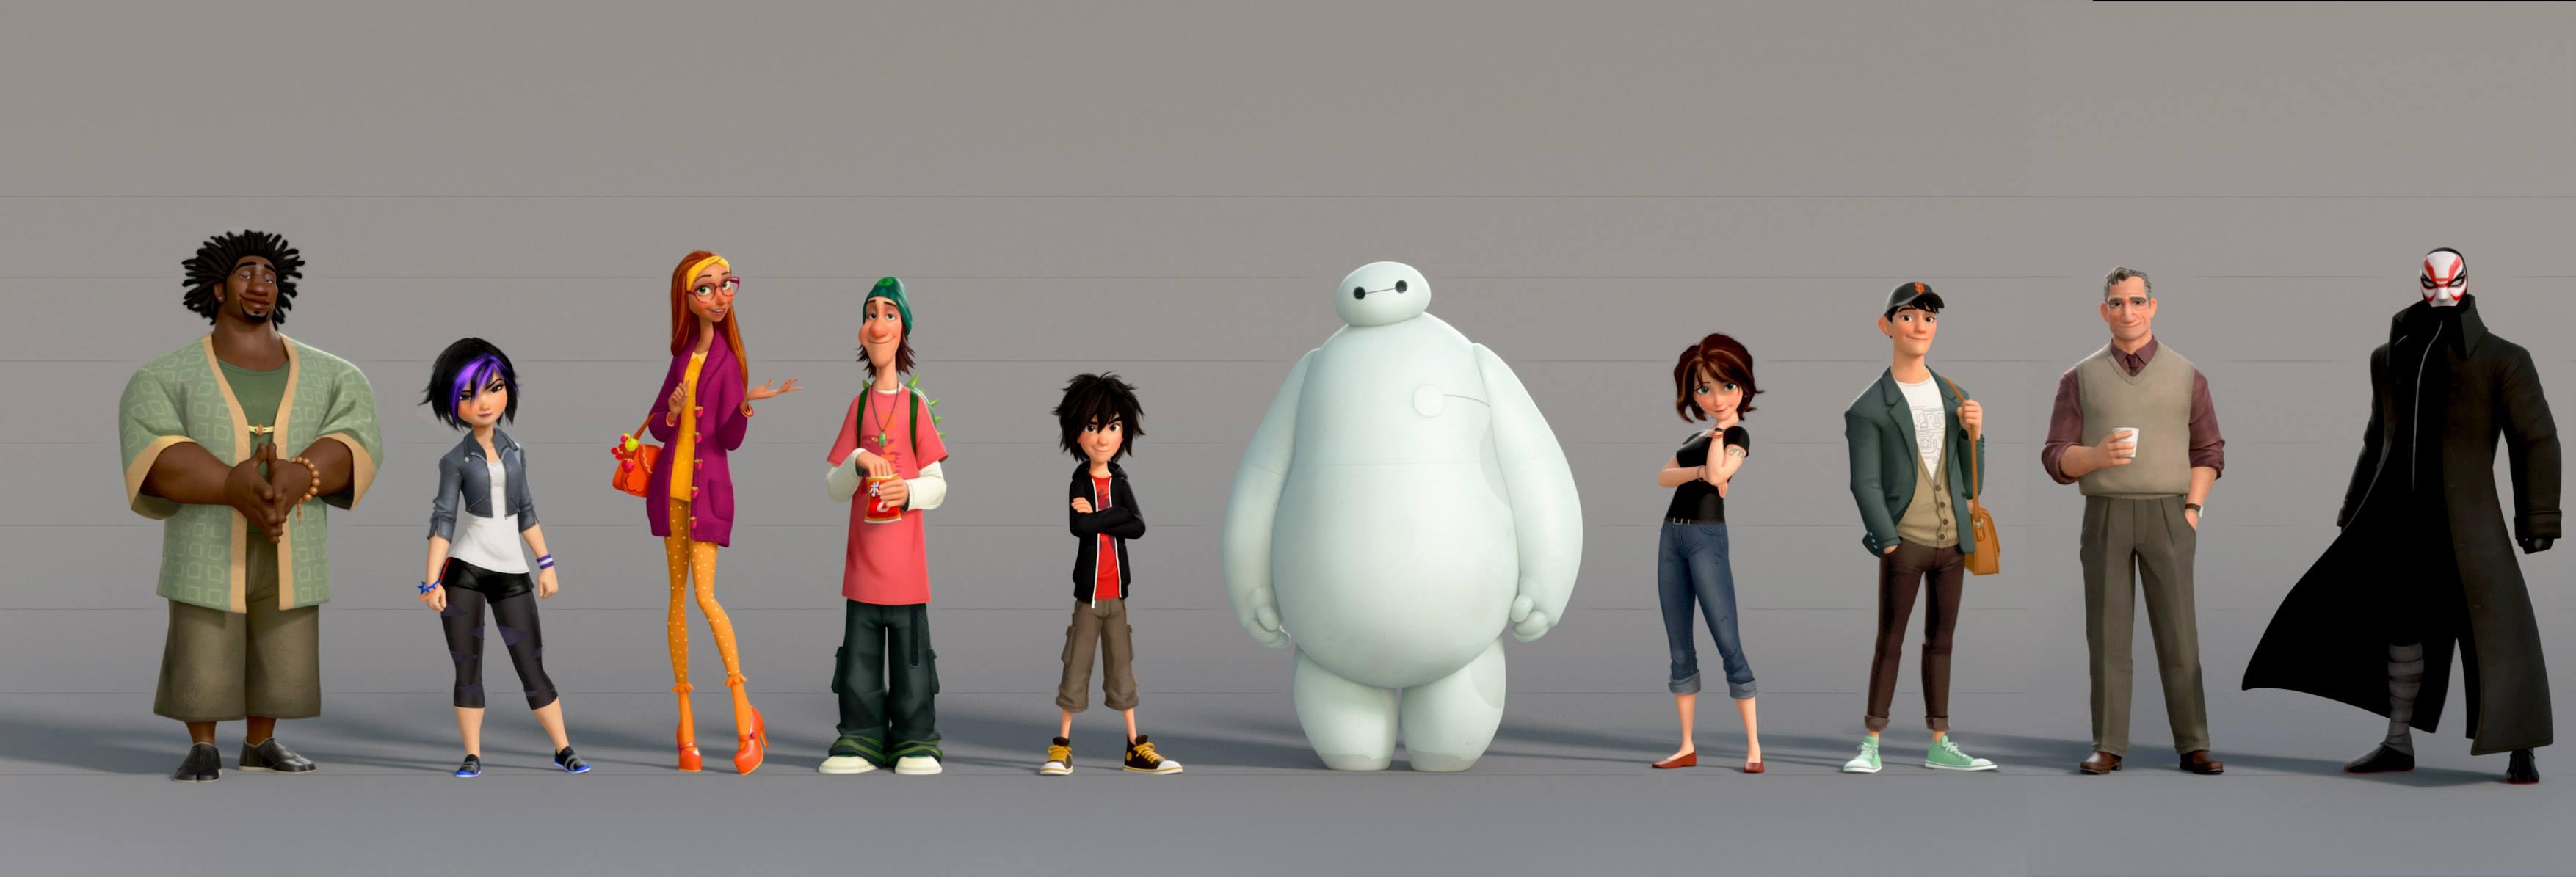 Image Big Hero 6 Characterspng Disney Wiki